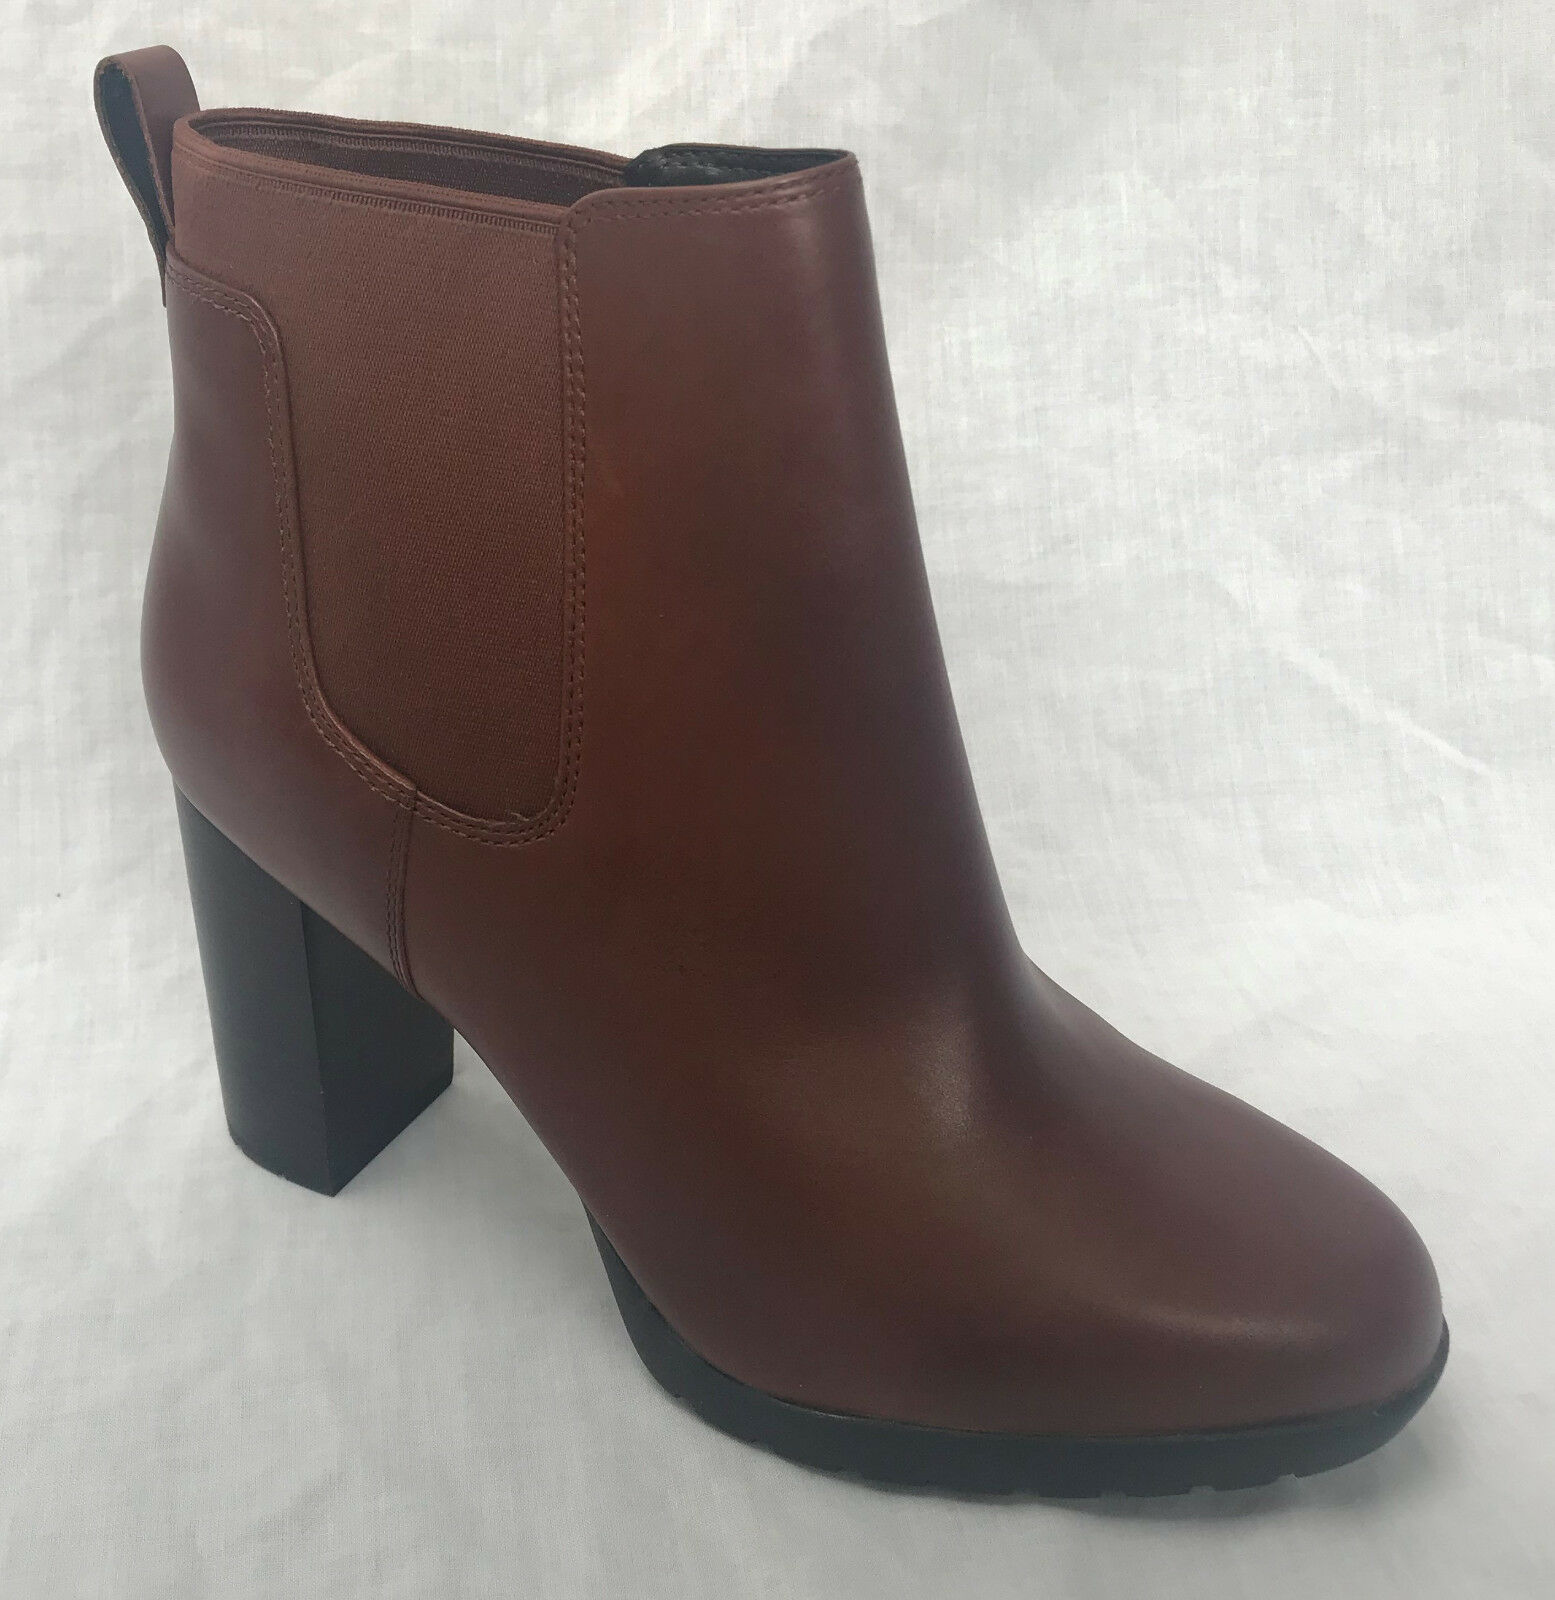 BNIB BNIB BNIB Clarks Ladies Elipsa Dee Tan Leather Chelsea Ankle Boots a26982